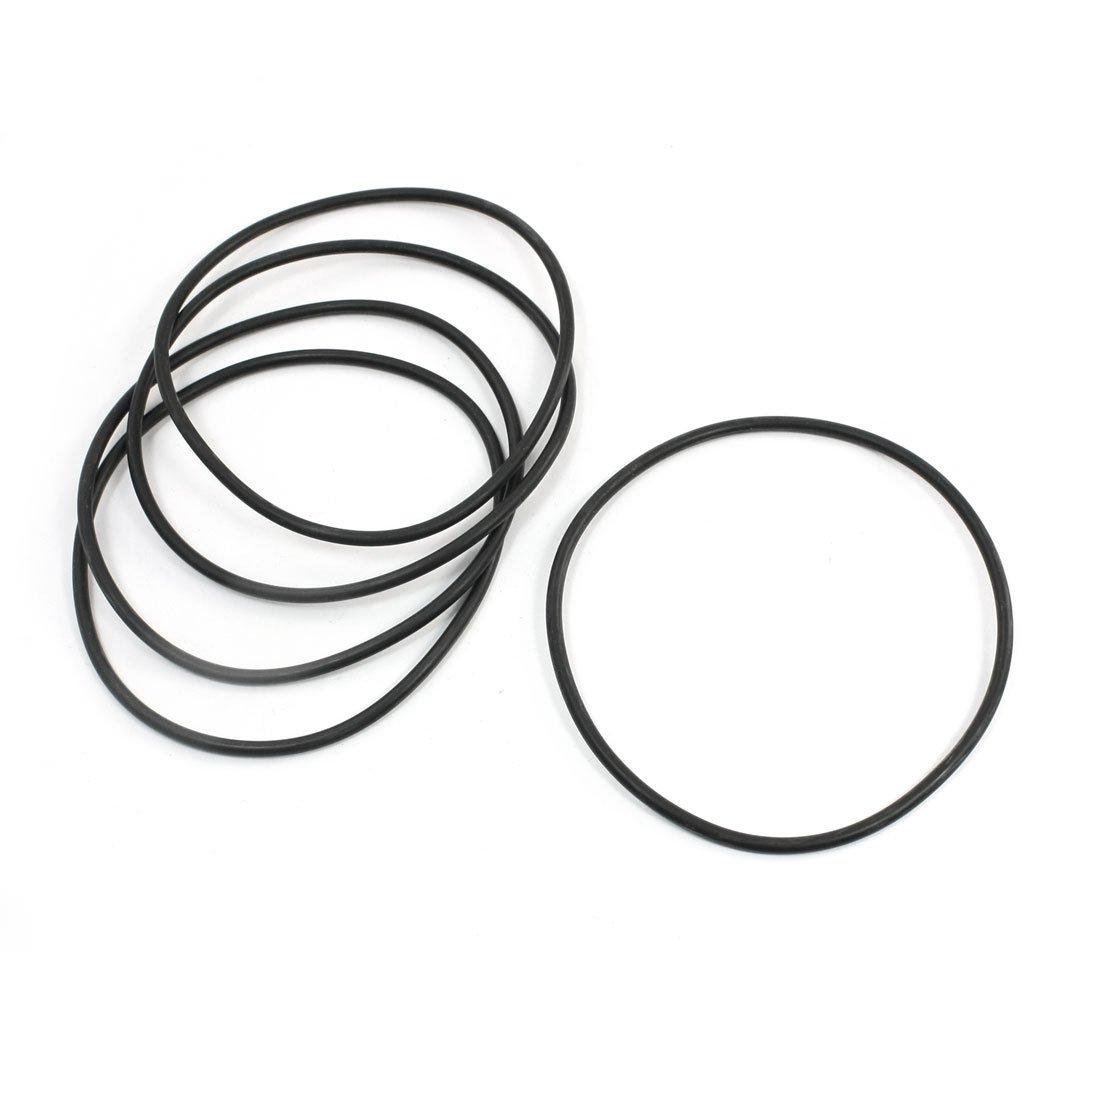 5/Paar 95/mm Dia 4/mm Querschnitt Industrie Gummi O Ringe Dichtung